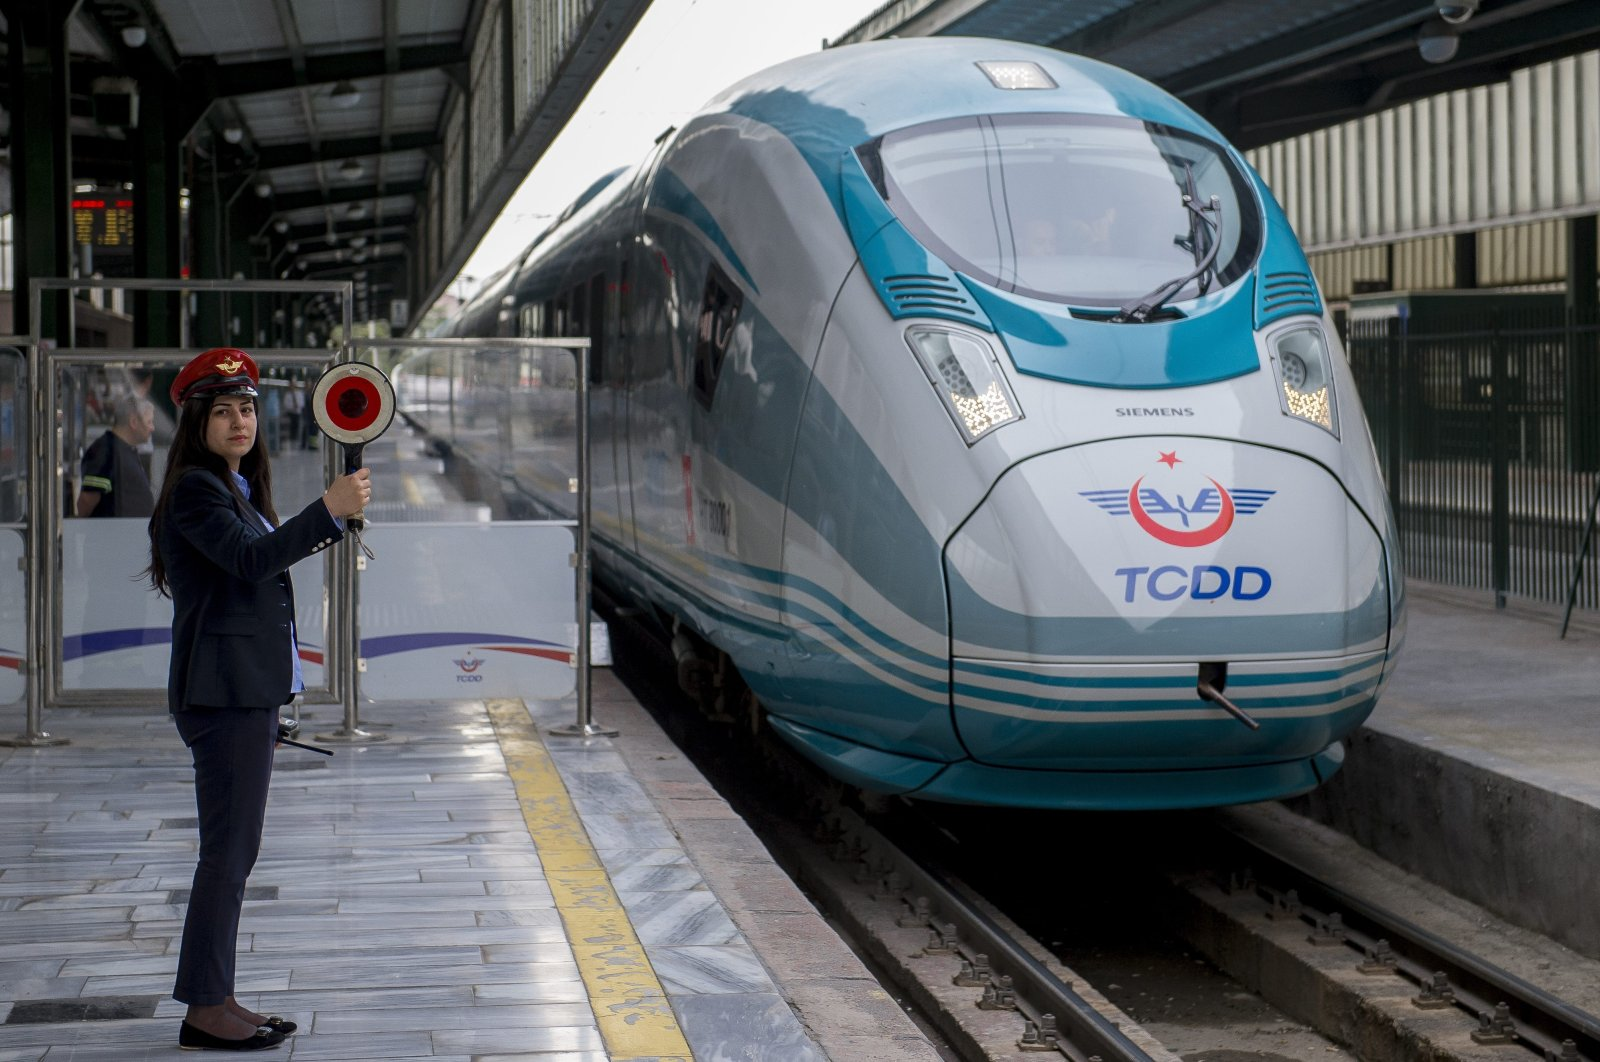 An ultra-high-speed train operating between the capital Ankara and central Konya province departs from Ankara Station, Turkey, May 25, 2015. (AA Photo)